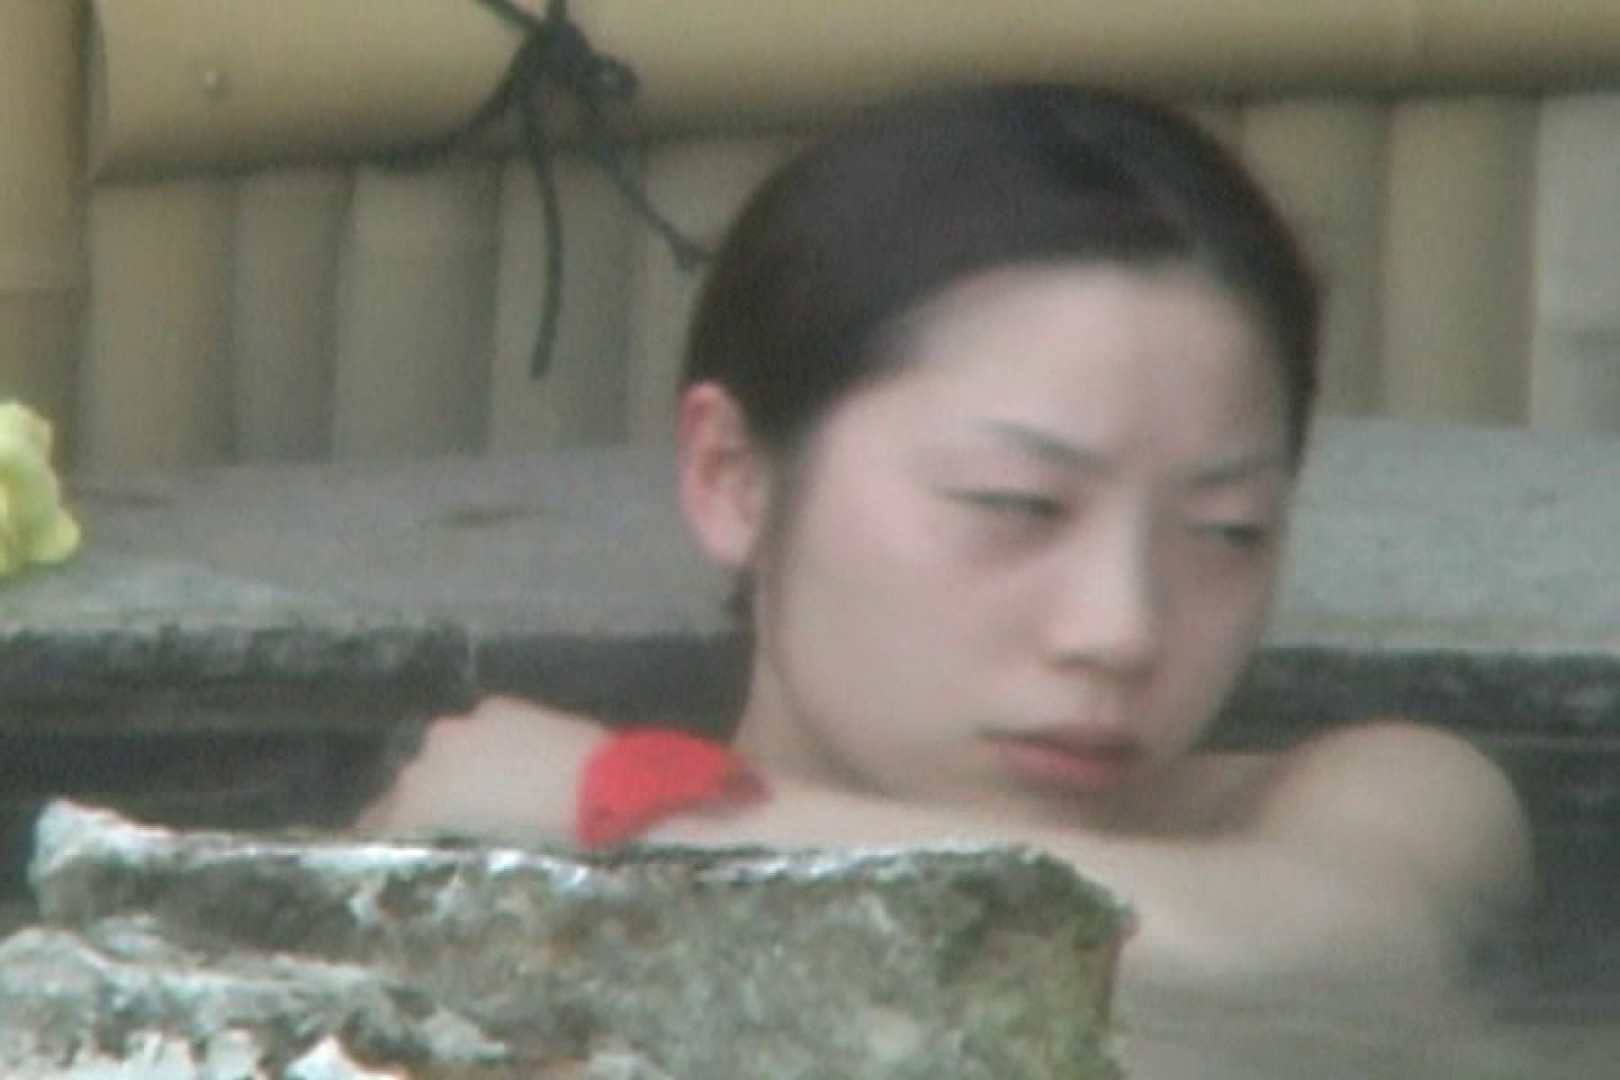 Aquaな露天風呂Vol.596 露天 覗きおまんこ画像 77画像 8